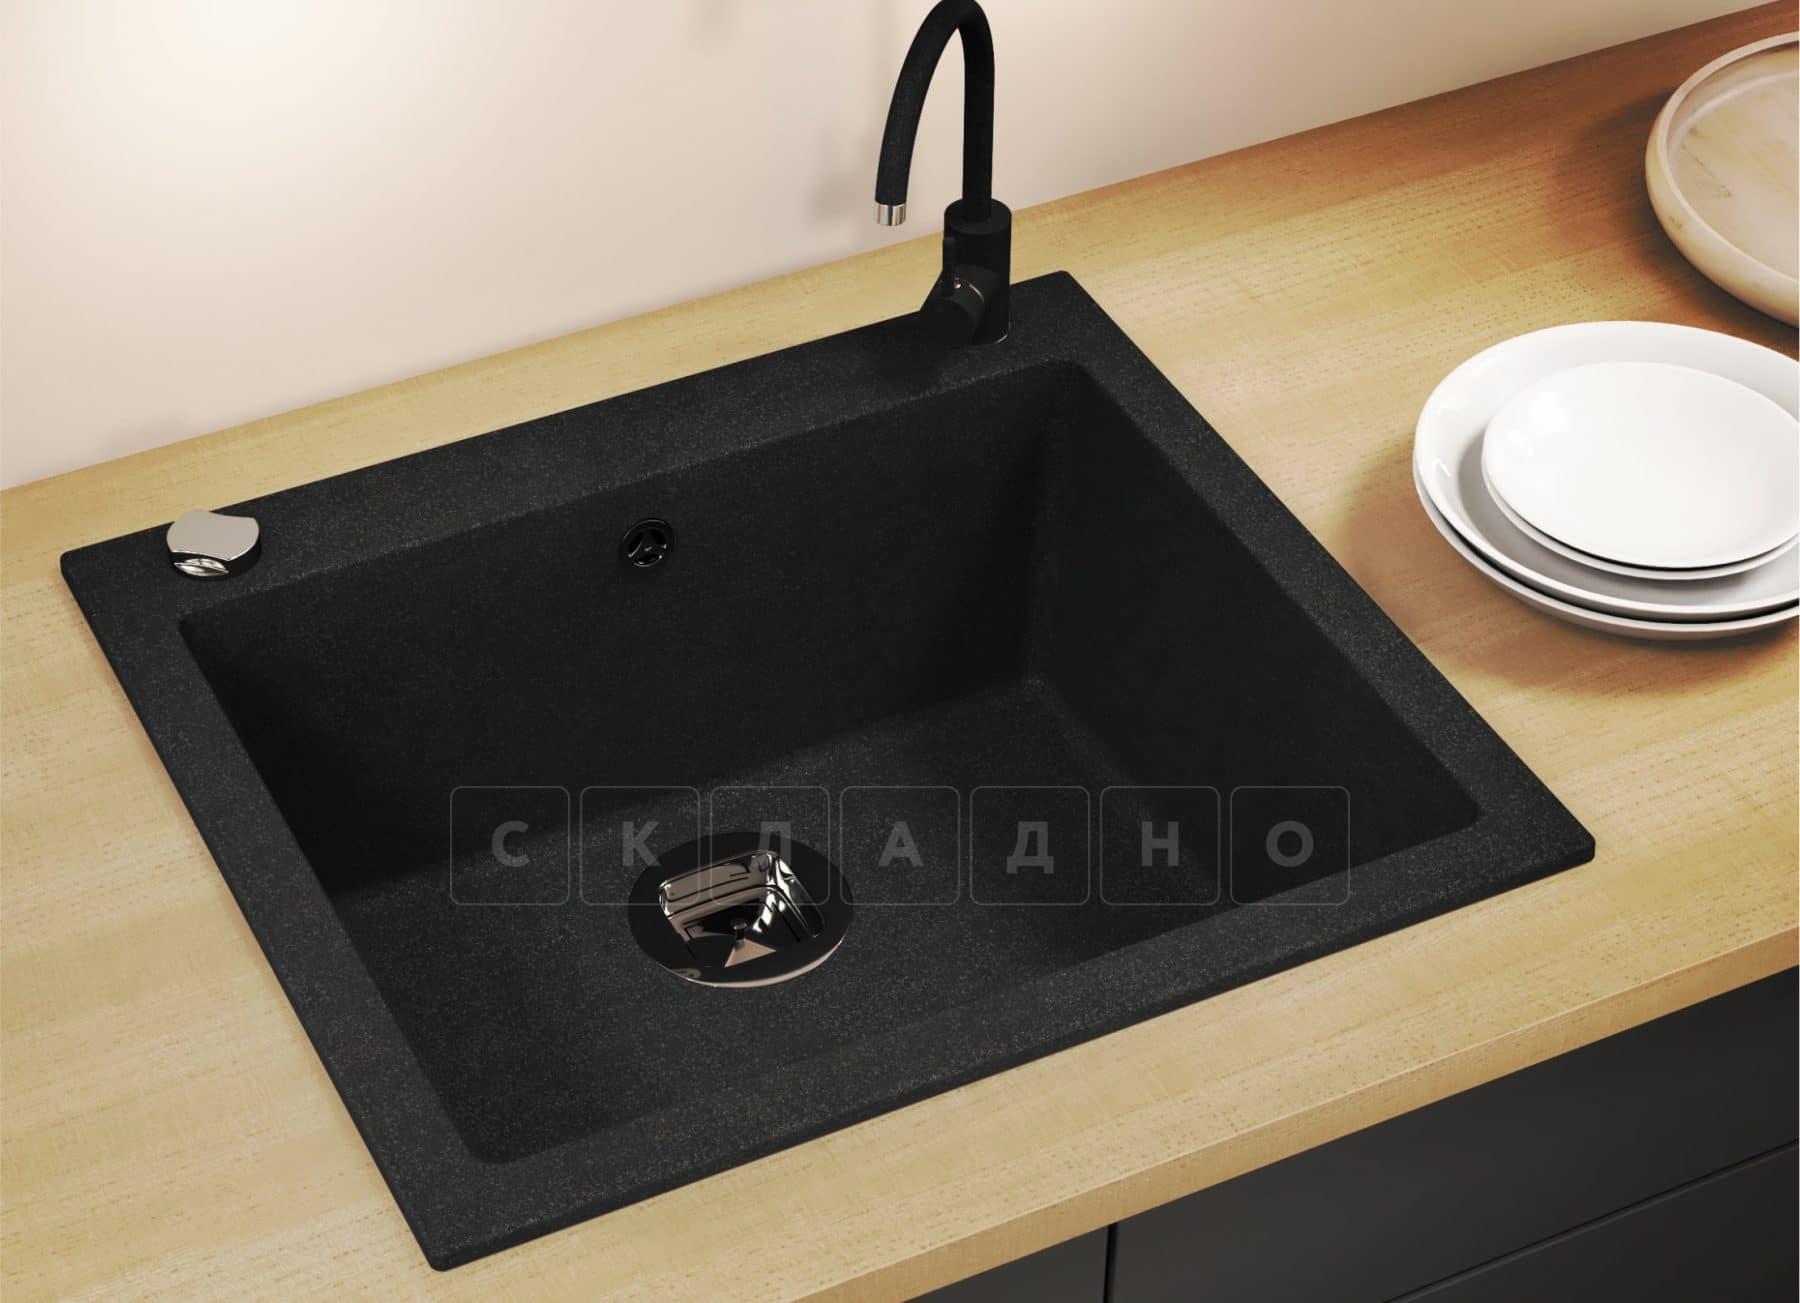 Кухонная мойка TOLERO R-111 кварцевая фото 10 | интернет-магазин Складно